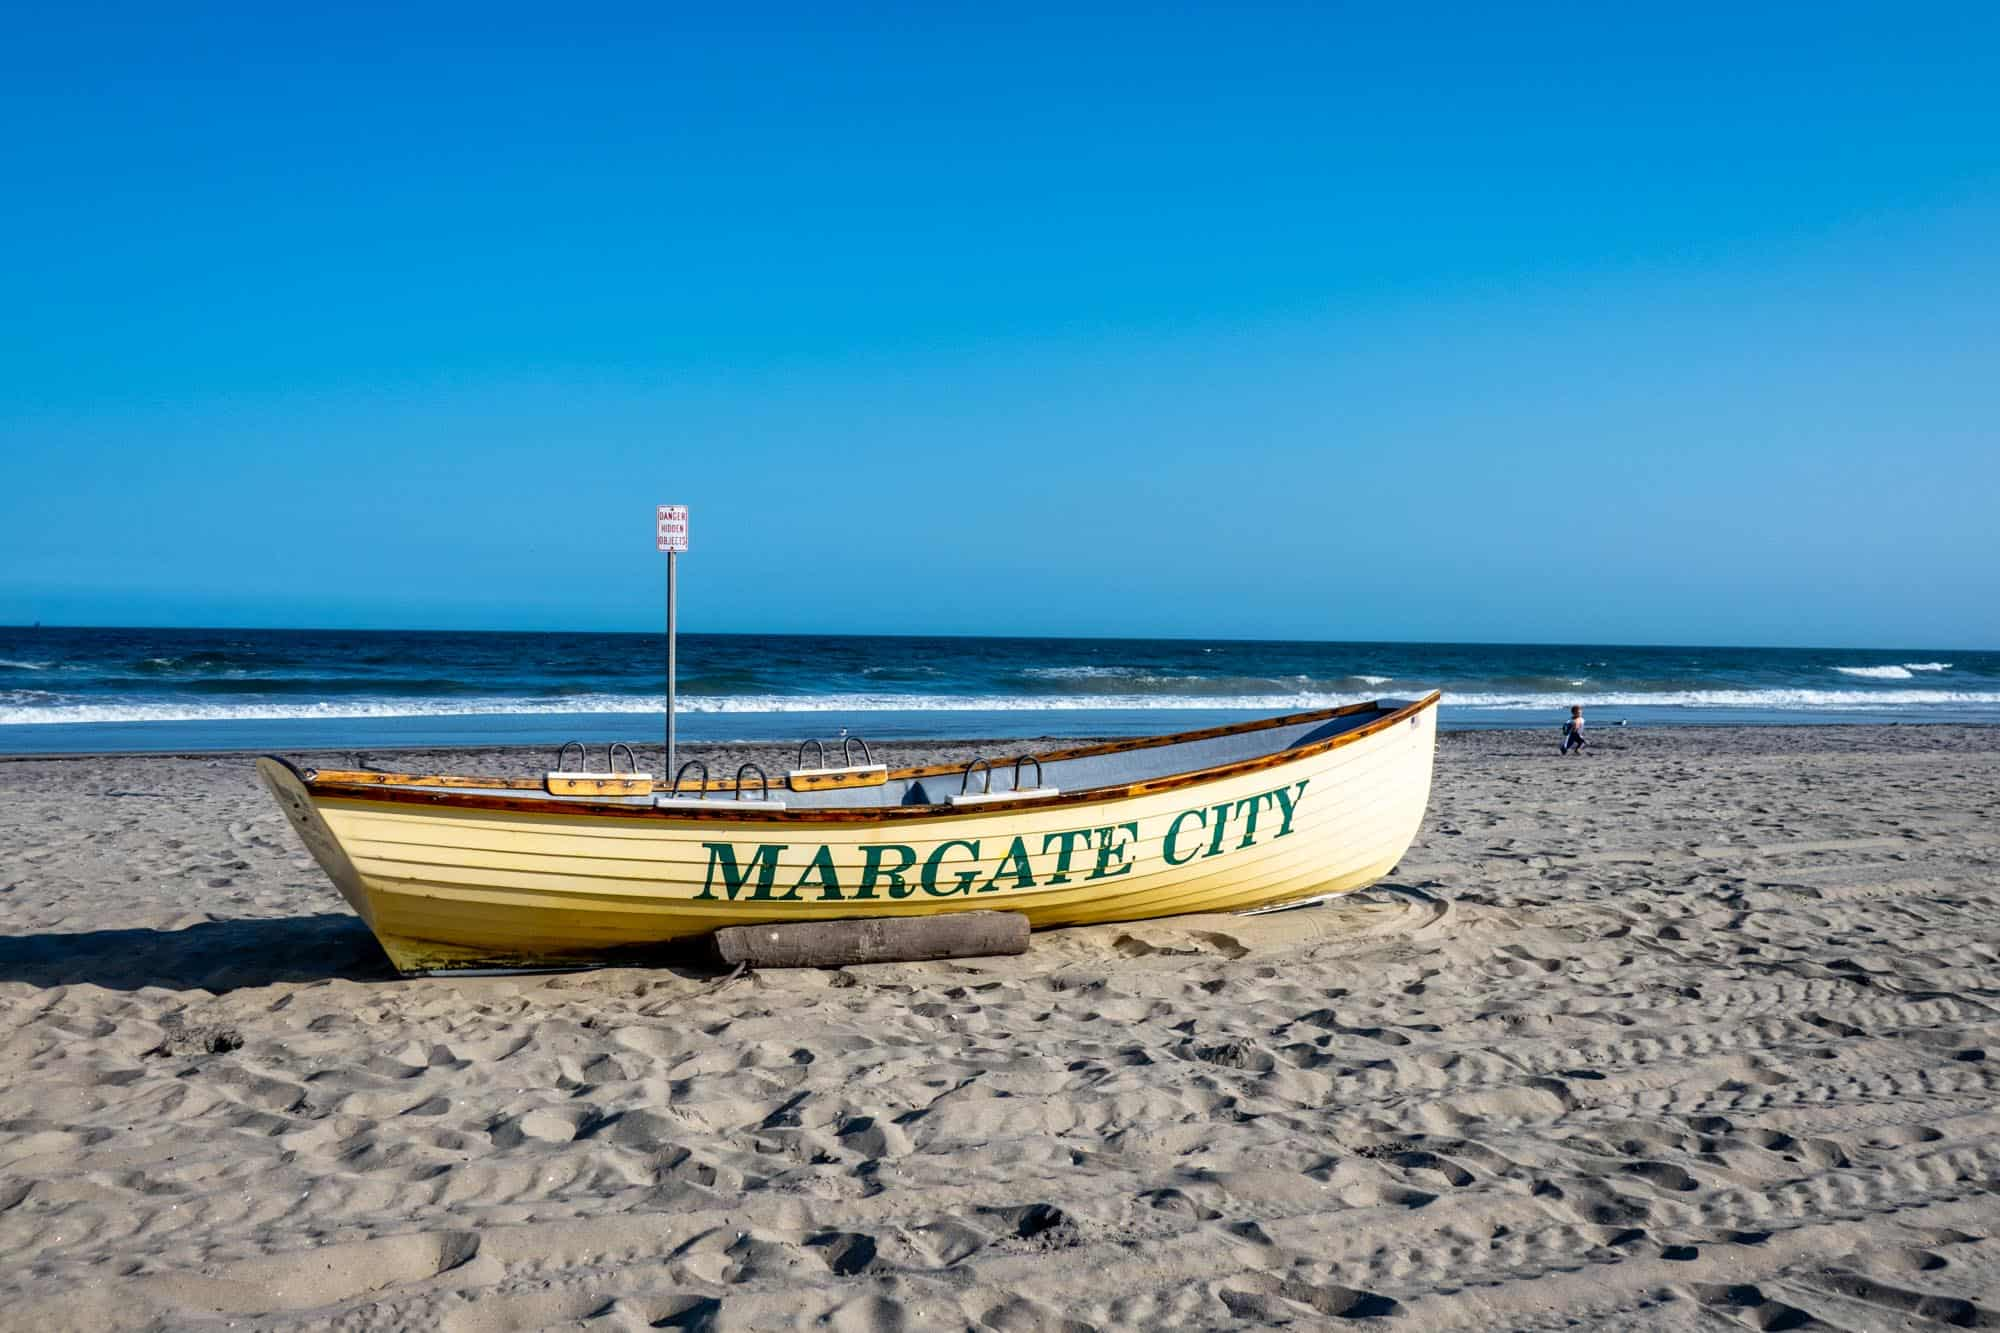 Margate City NJ lifeboat on sandy beach